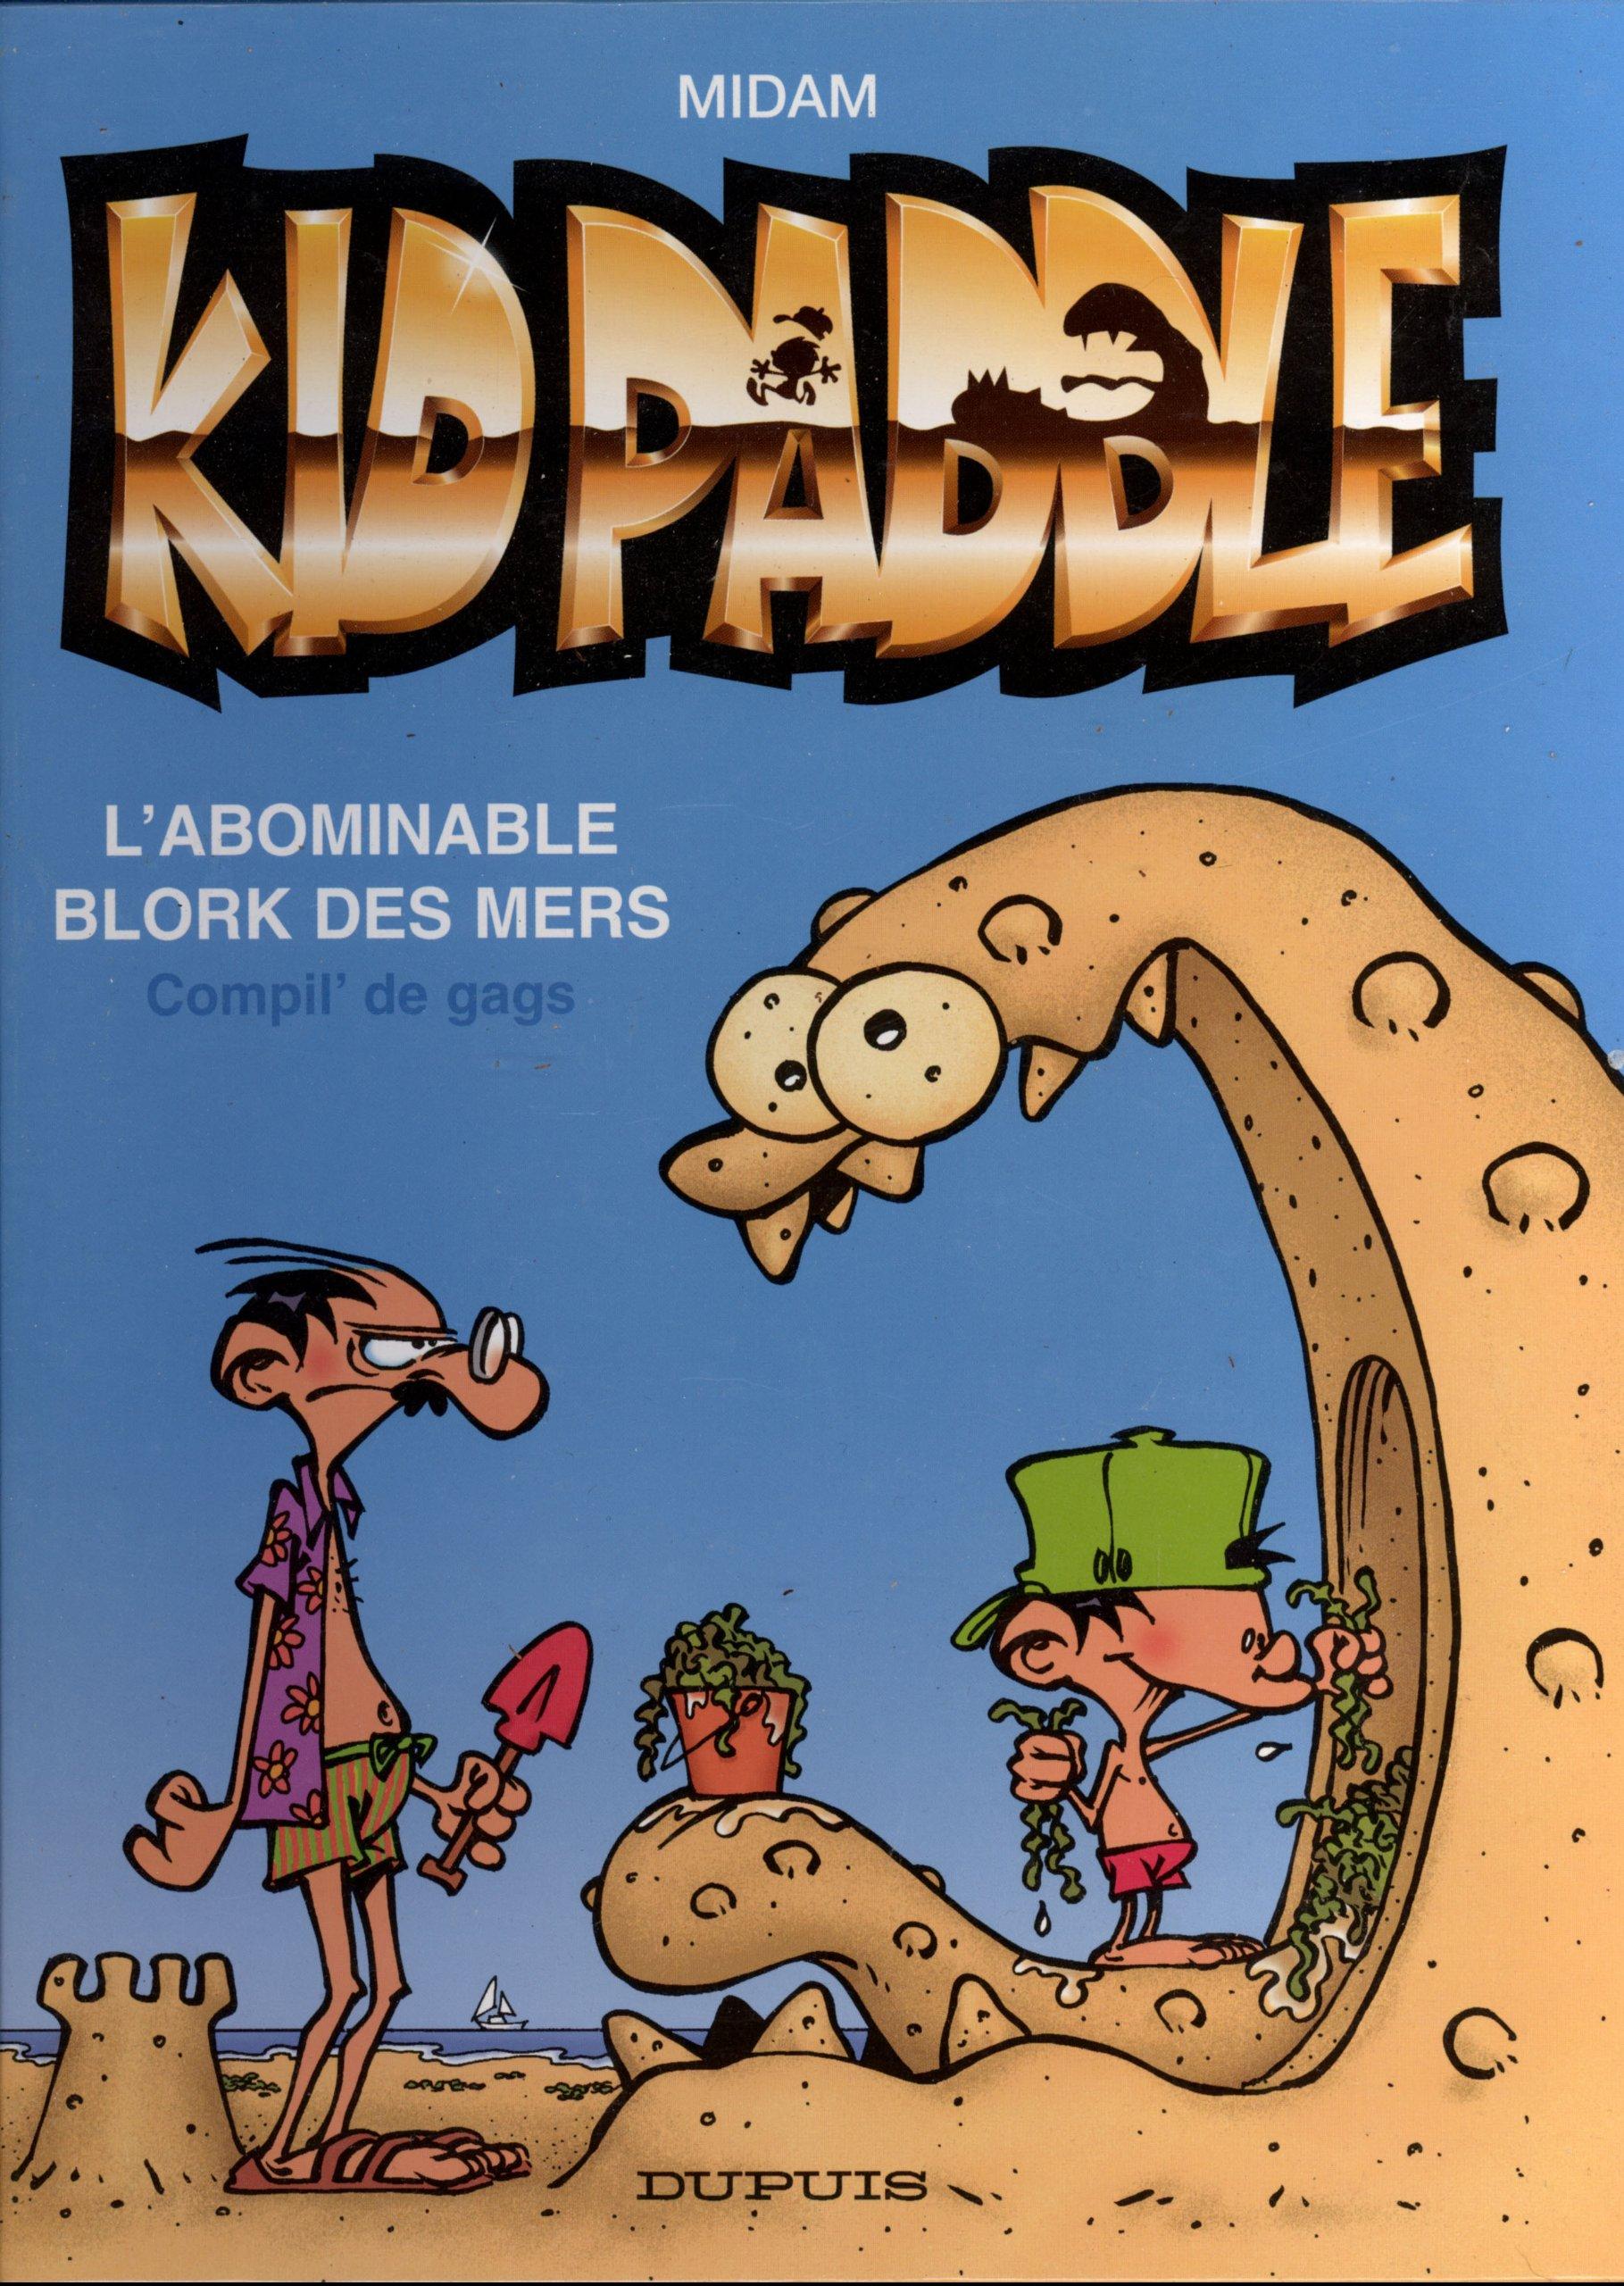 Amazon Fr Kidpaddle L Abominable Blork Des Mers Compil De Gags Midam Livres